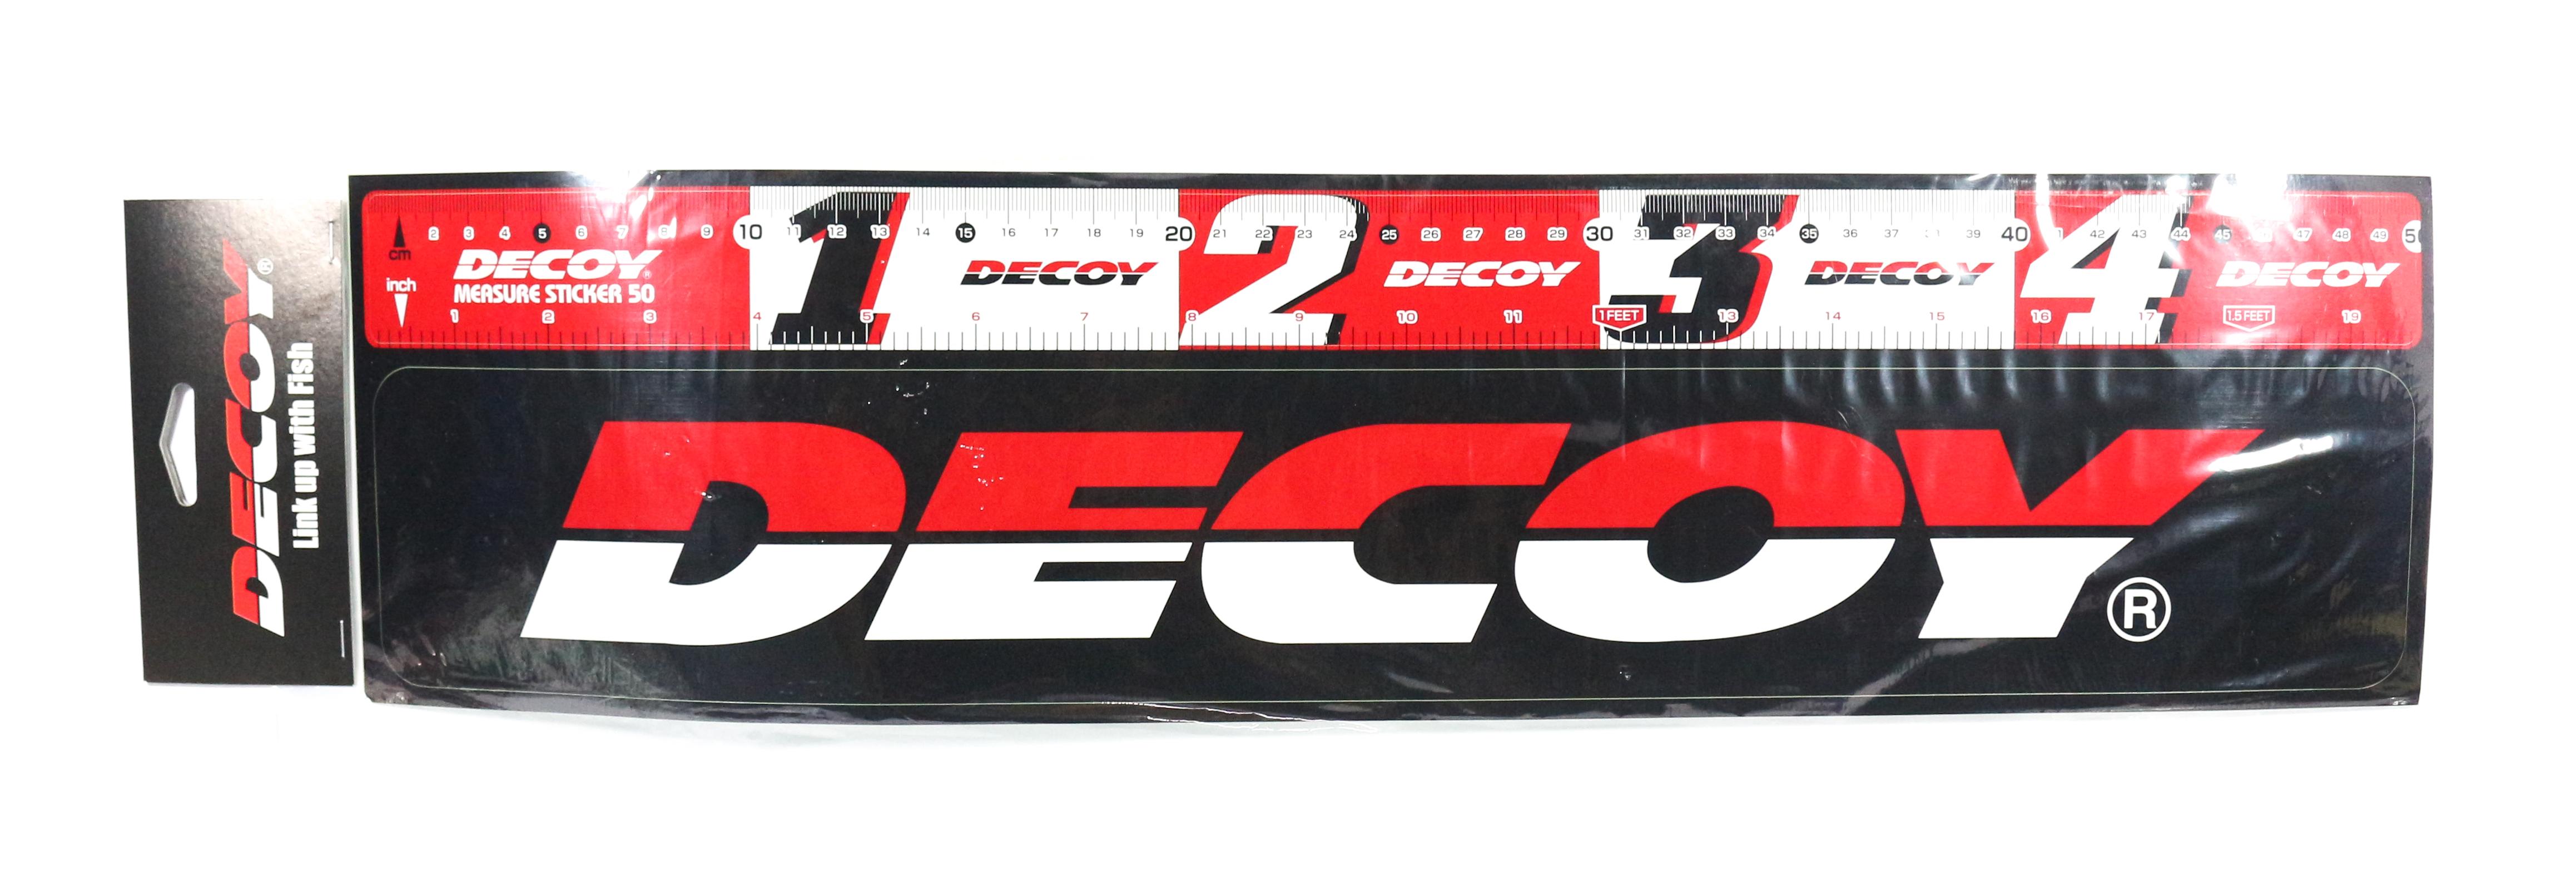 Decoy DA-5 Measure Sticker 50cm (0652)